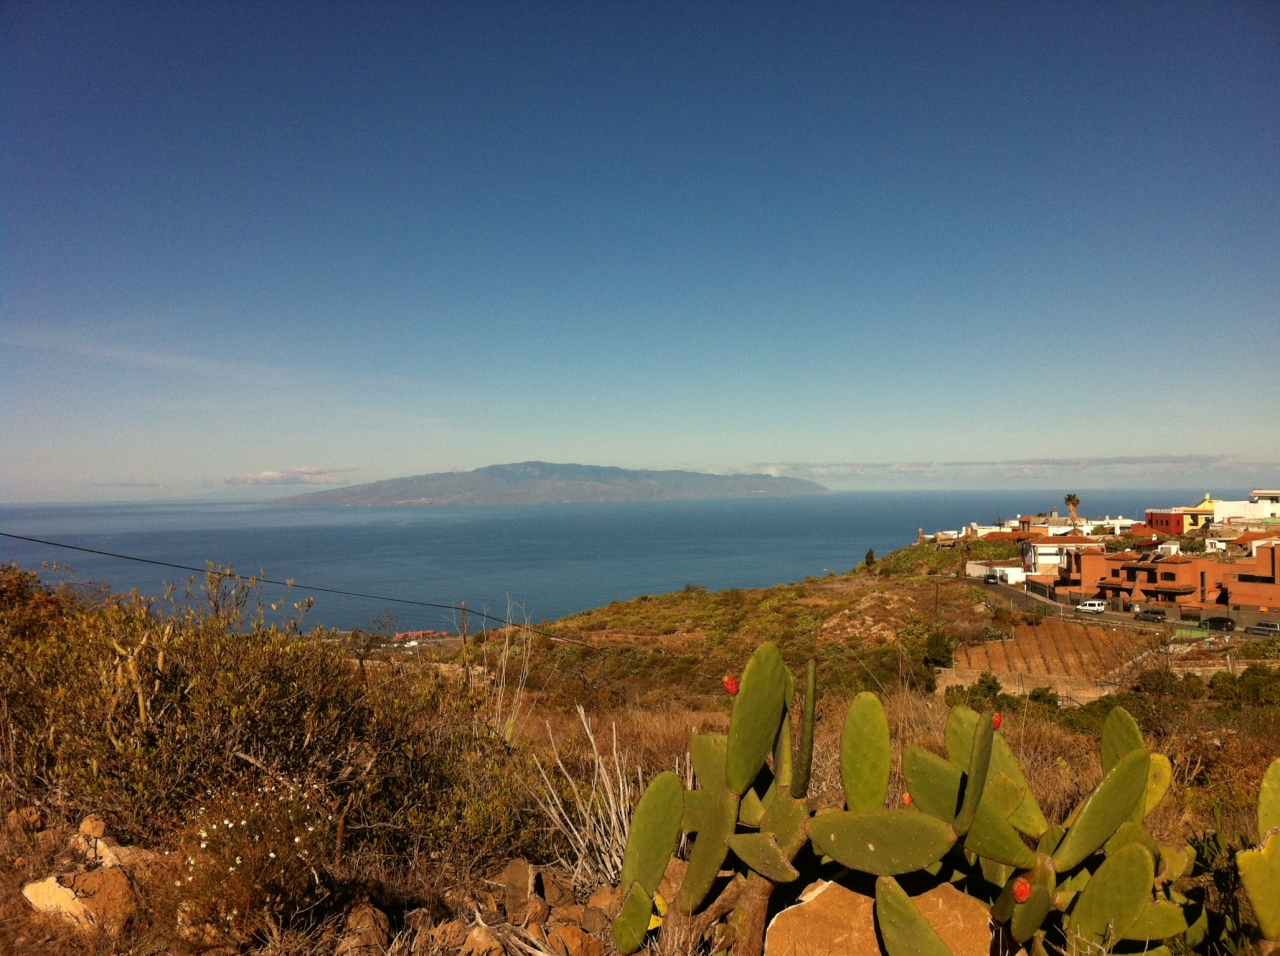 A view of La Gomera island. [Photo by me, 2016.]